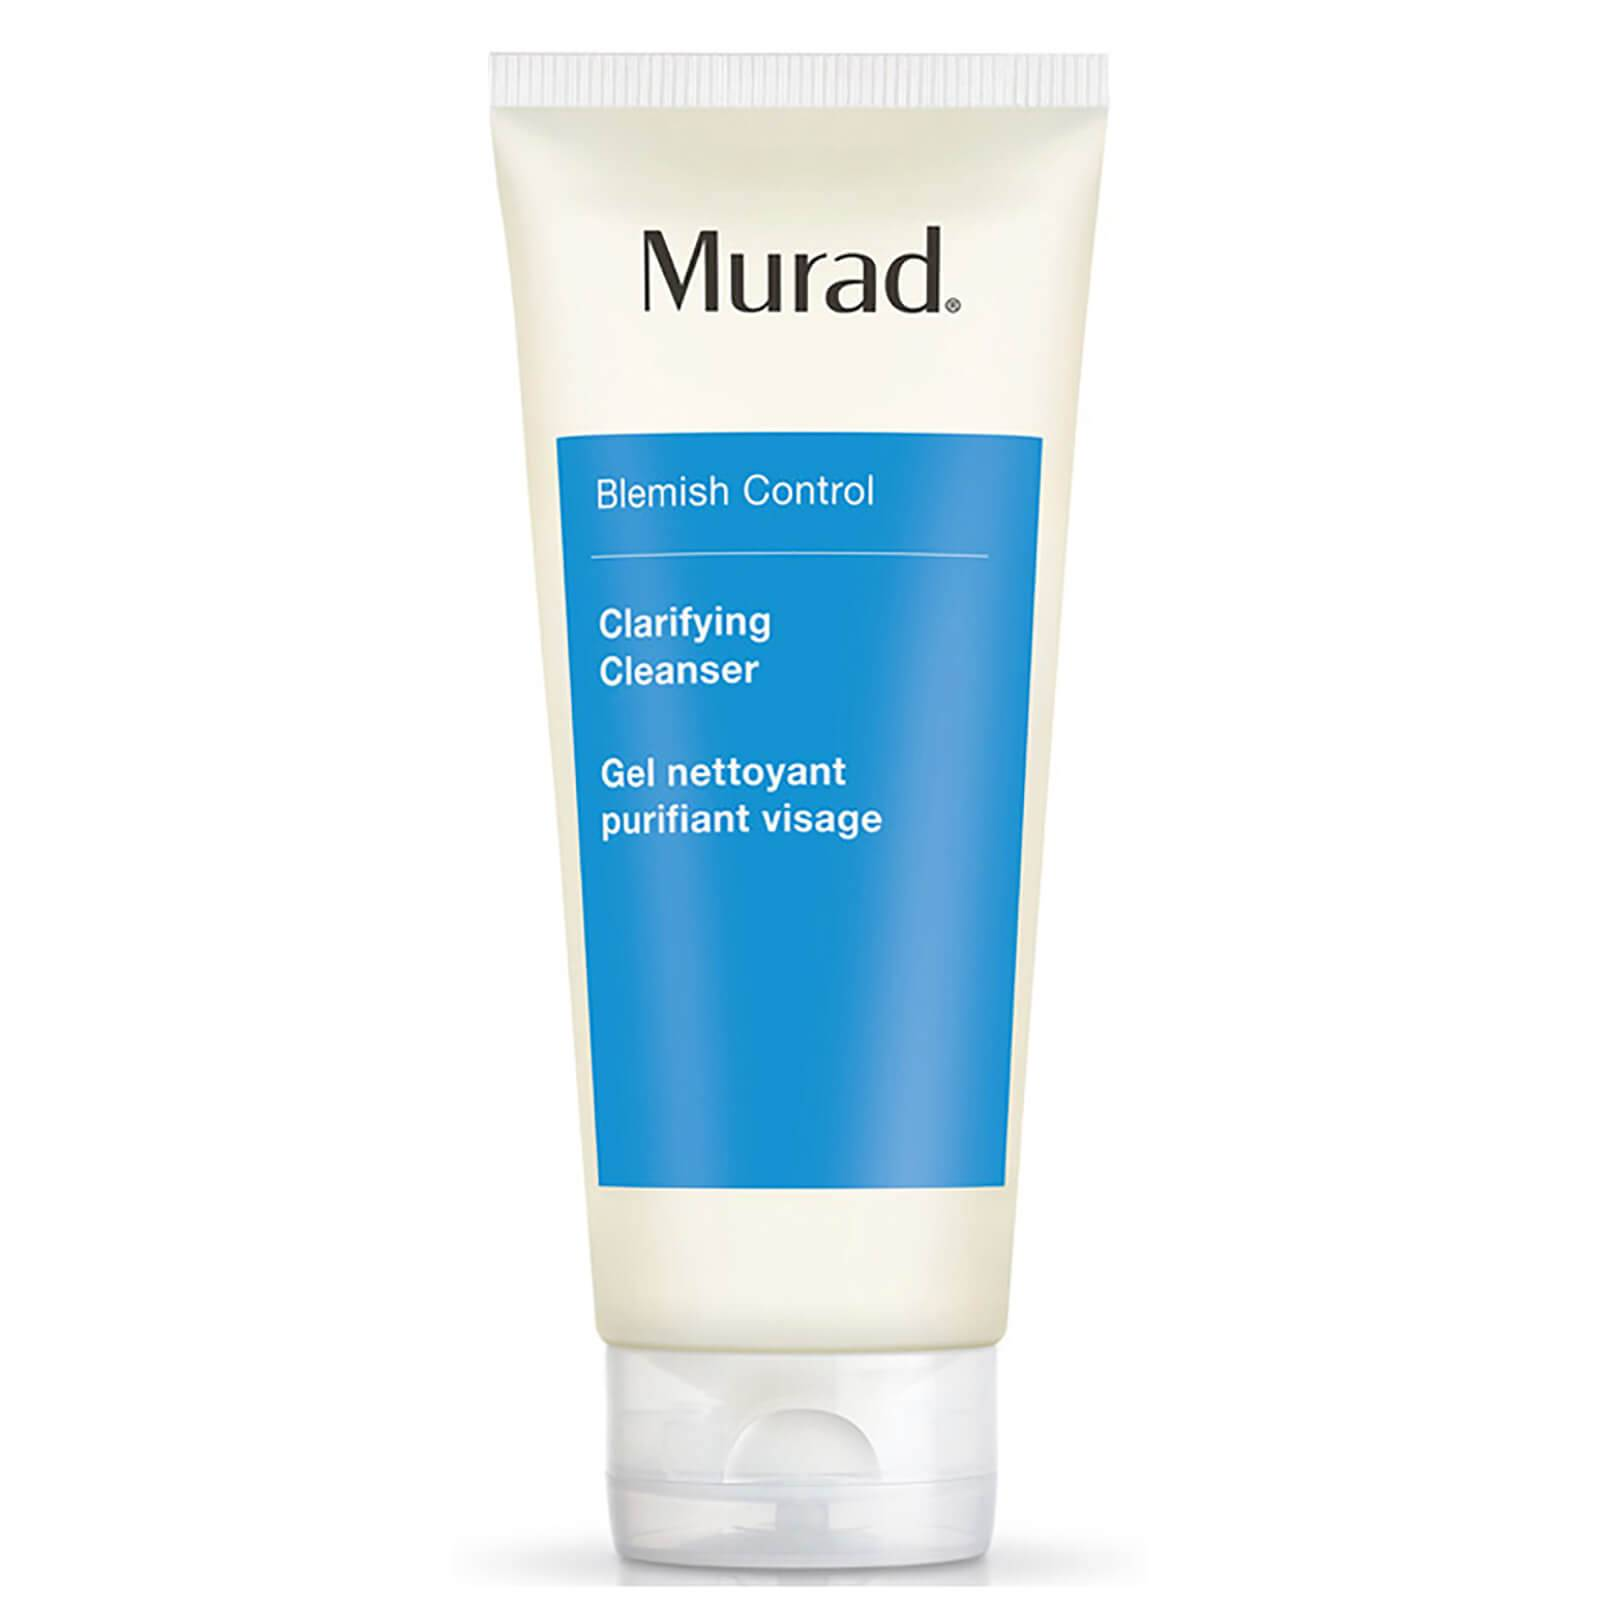 Murad Clarifying Cleanser Gel nettoyant éclaircissant 200ml